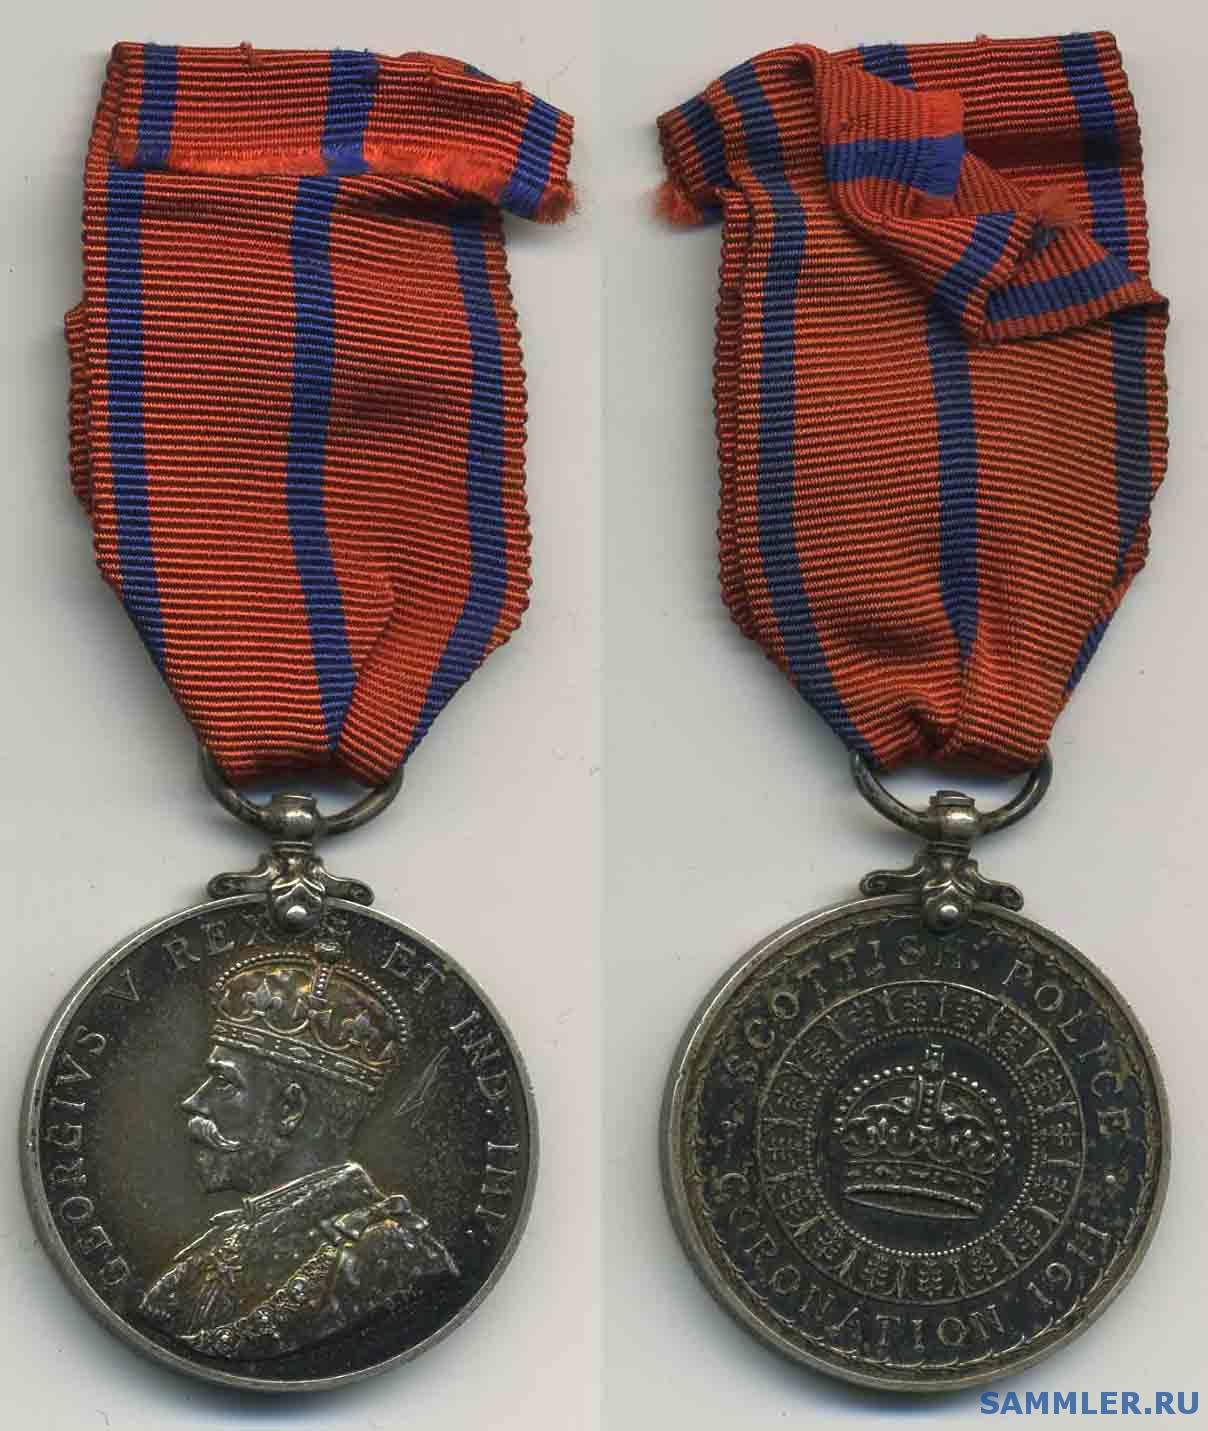 Coronation_1911_Medal_Scotish_Police.jpg